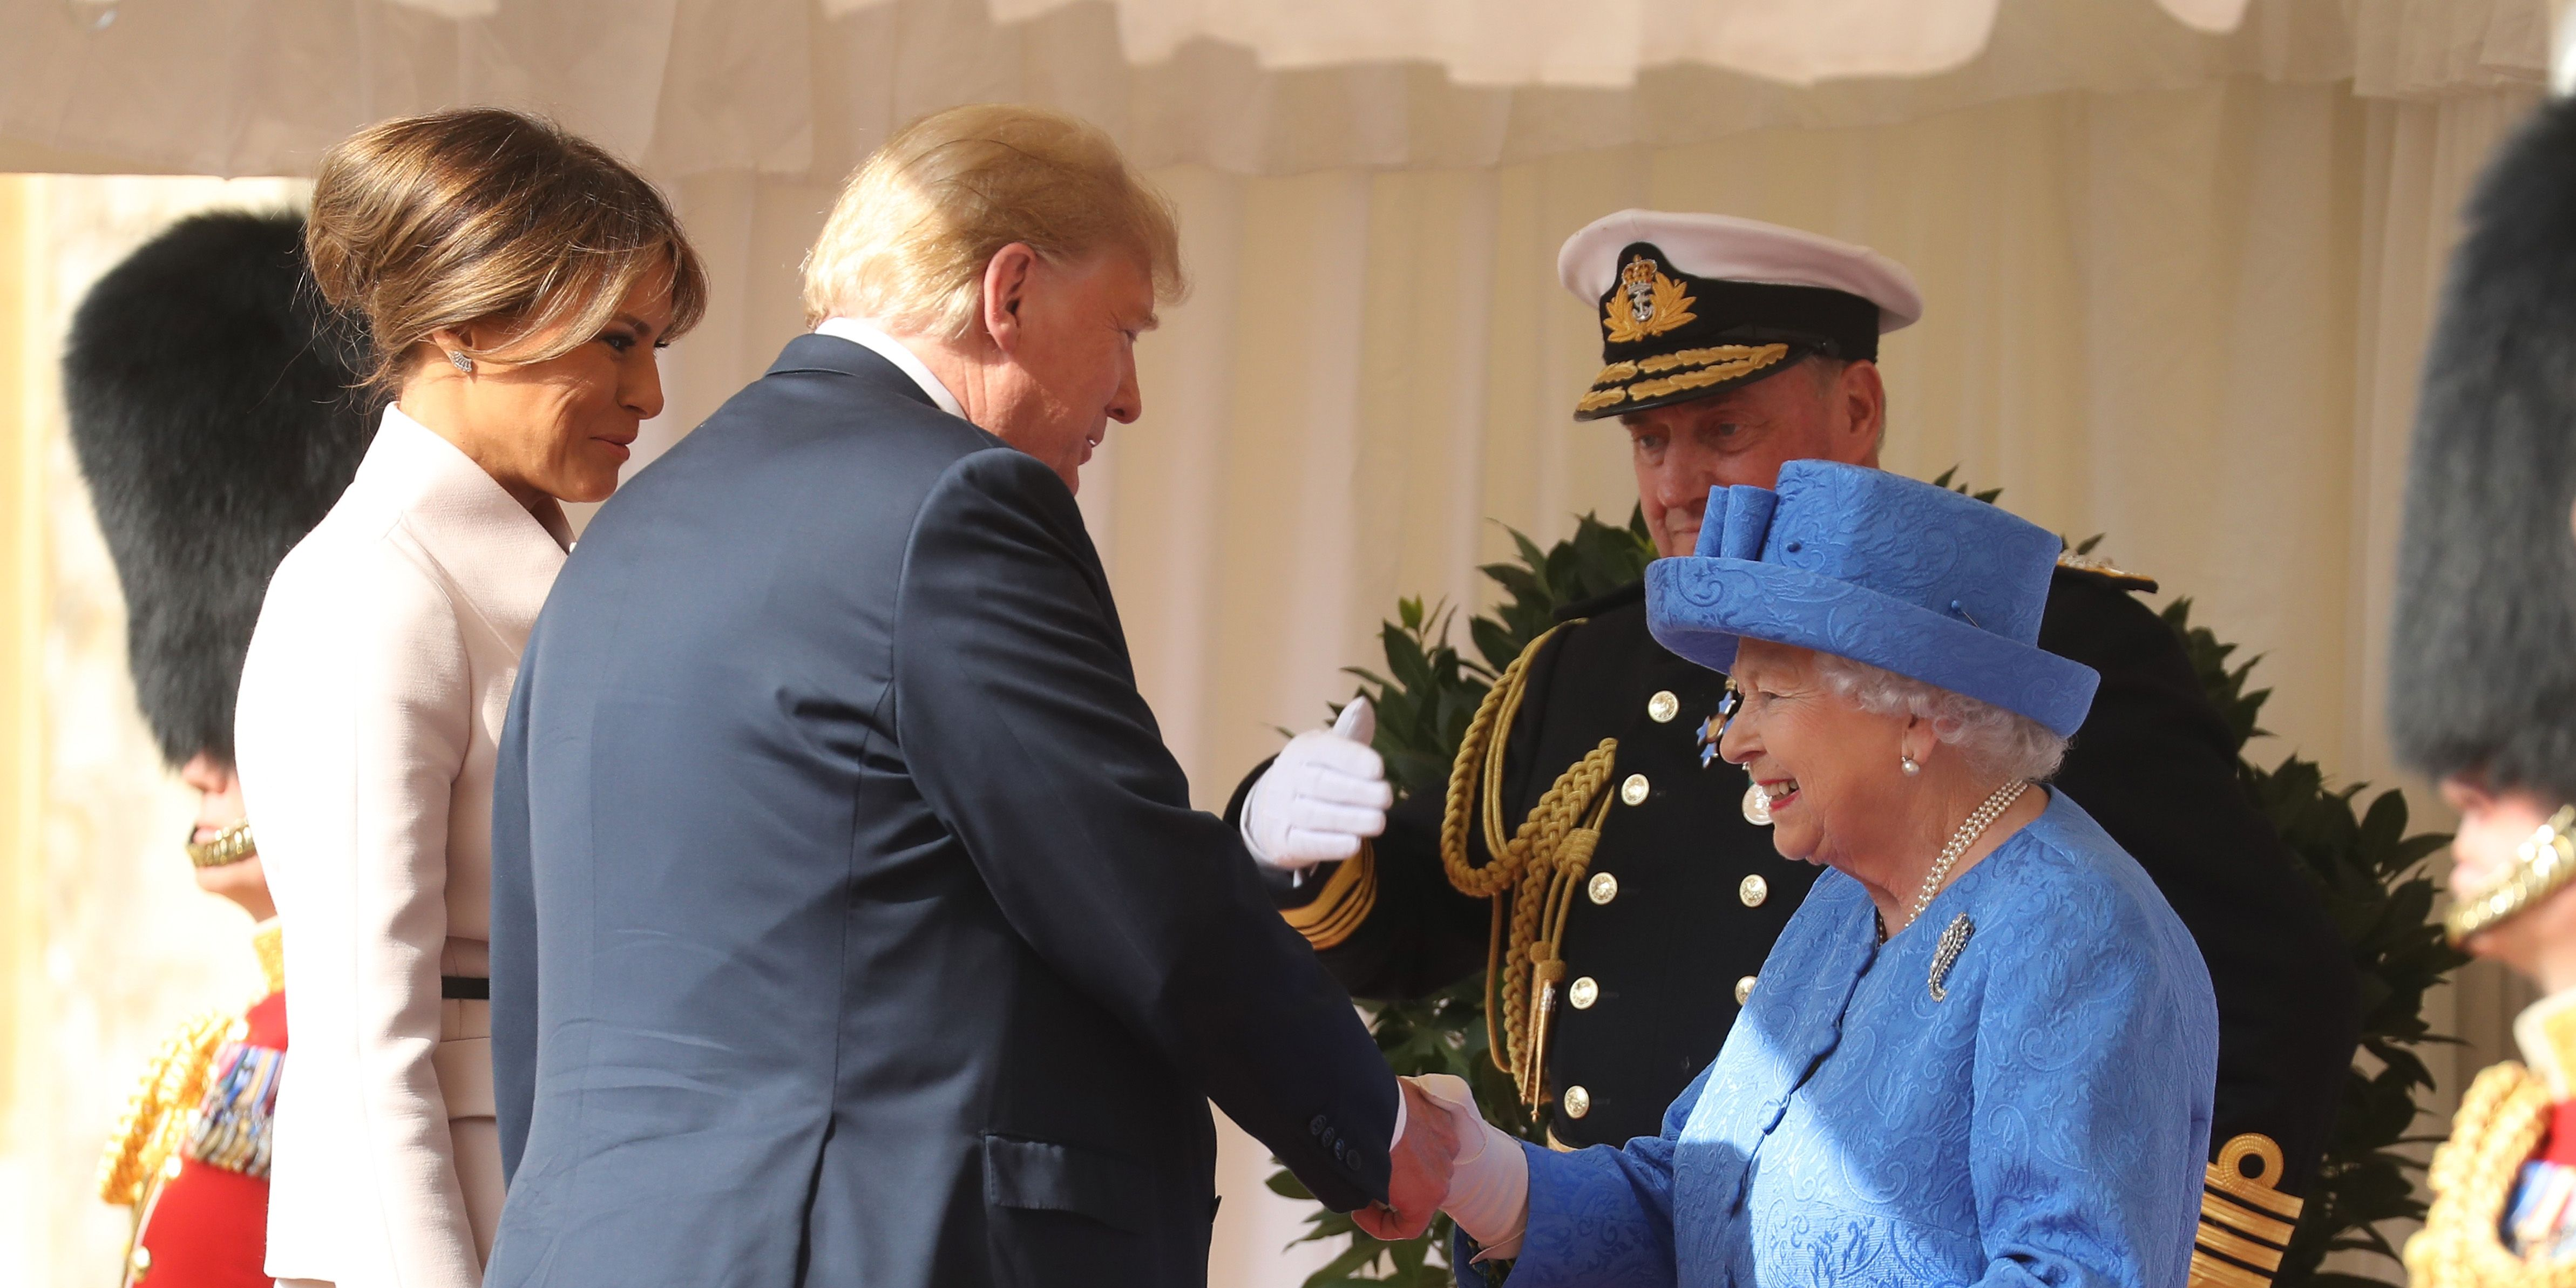 regina-elisabetta-donald-trump